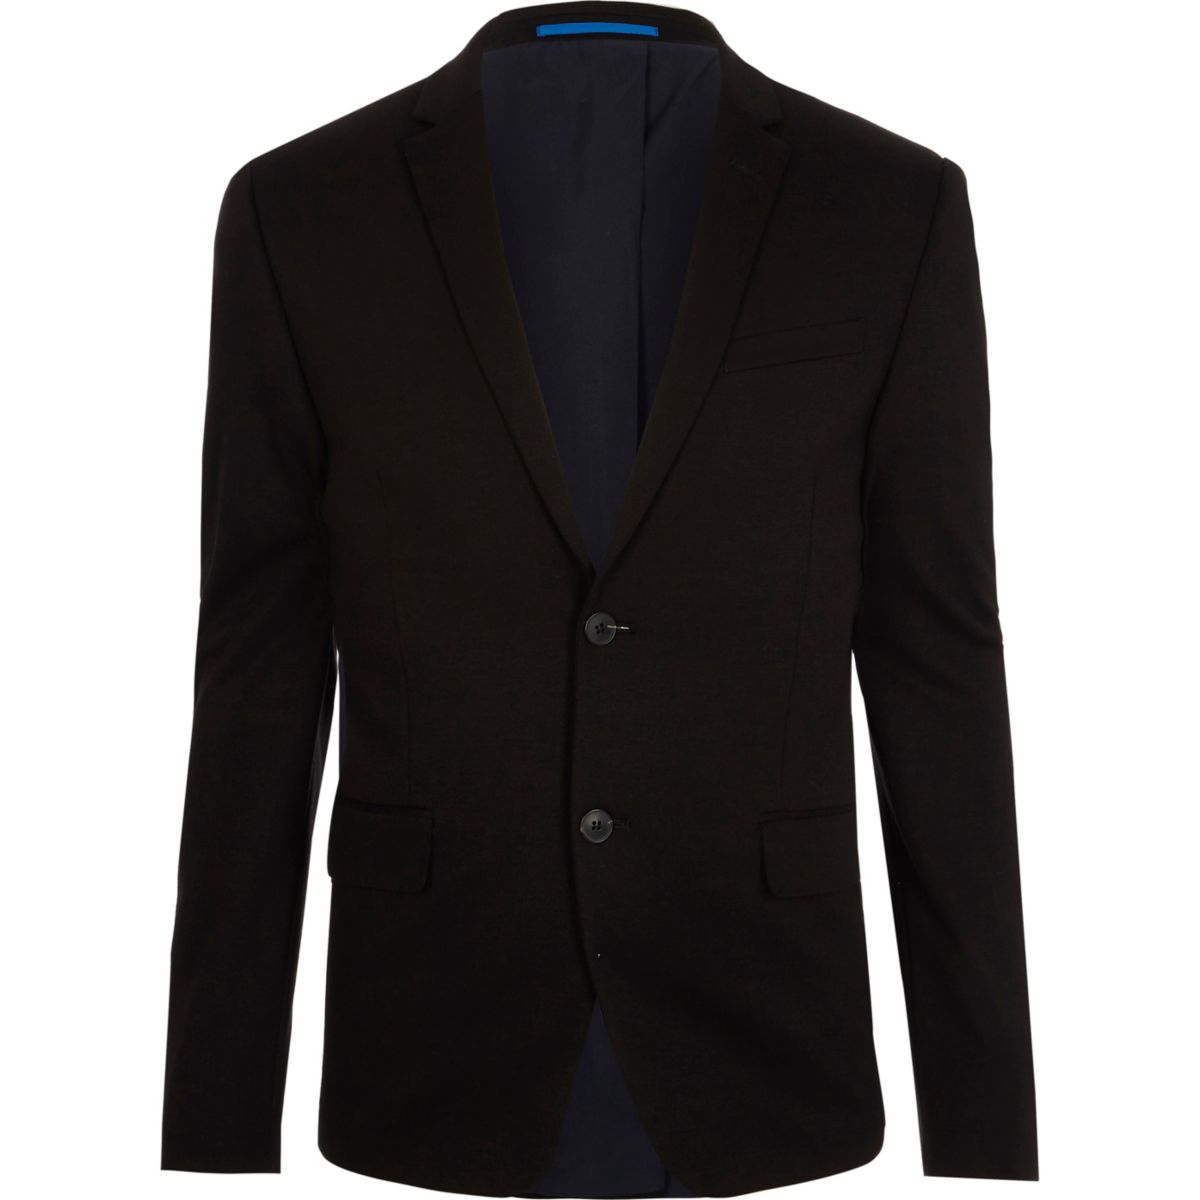 Veste de costume skinny en jersey noire